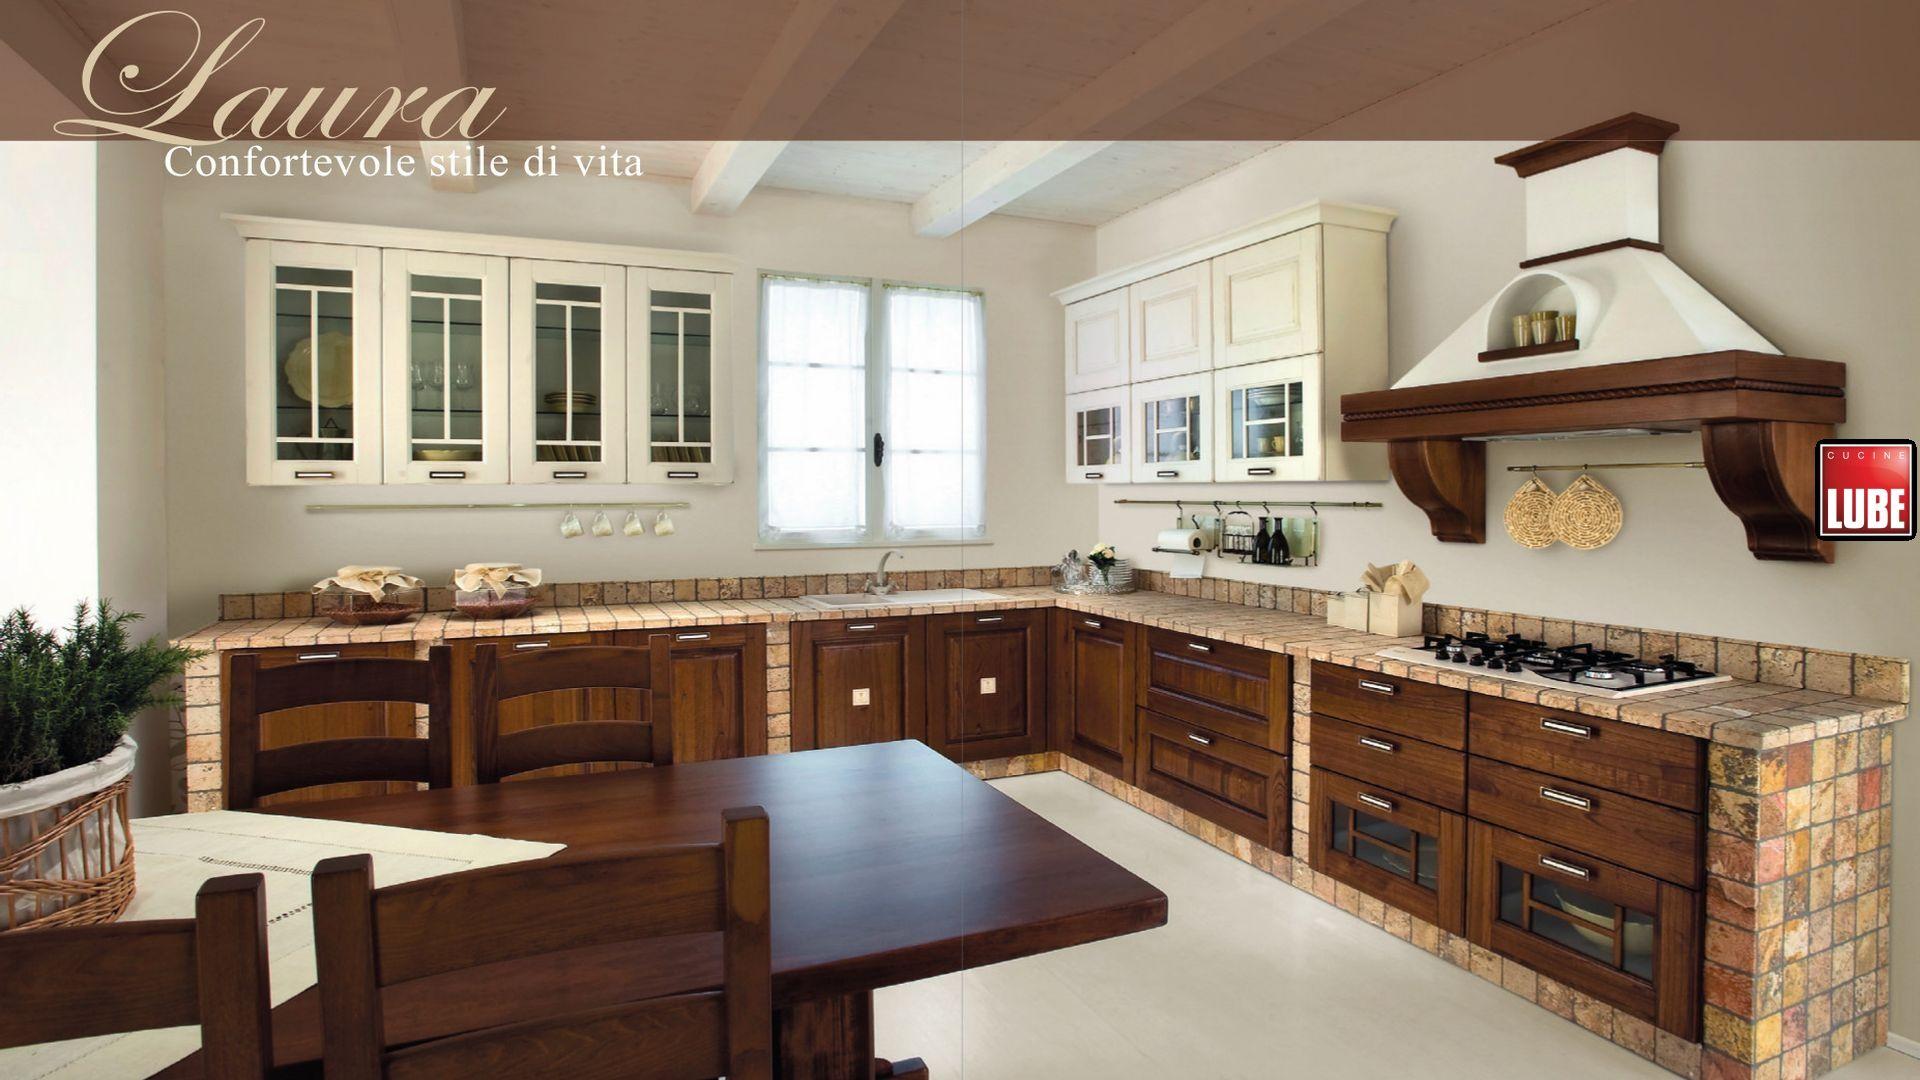 Cucine rustiche cucina laura cucine pinterest for Cucine pinterest